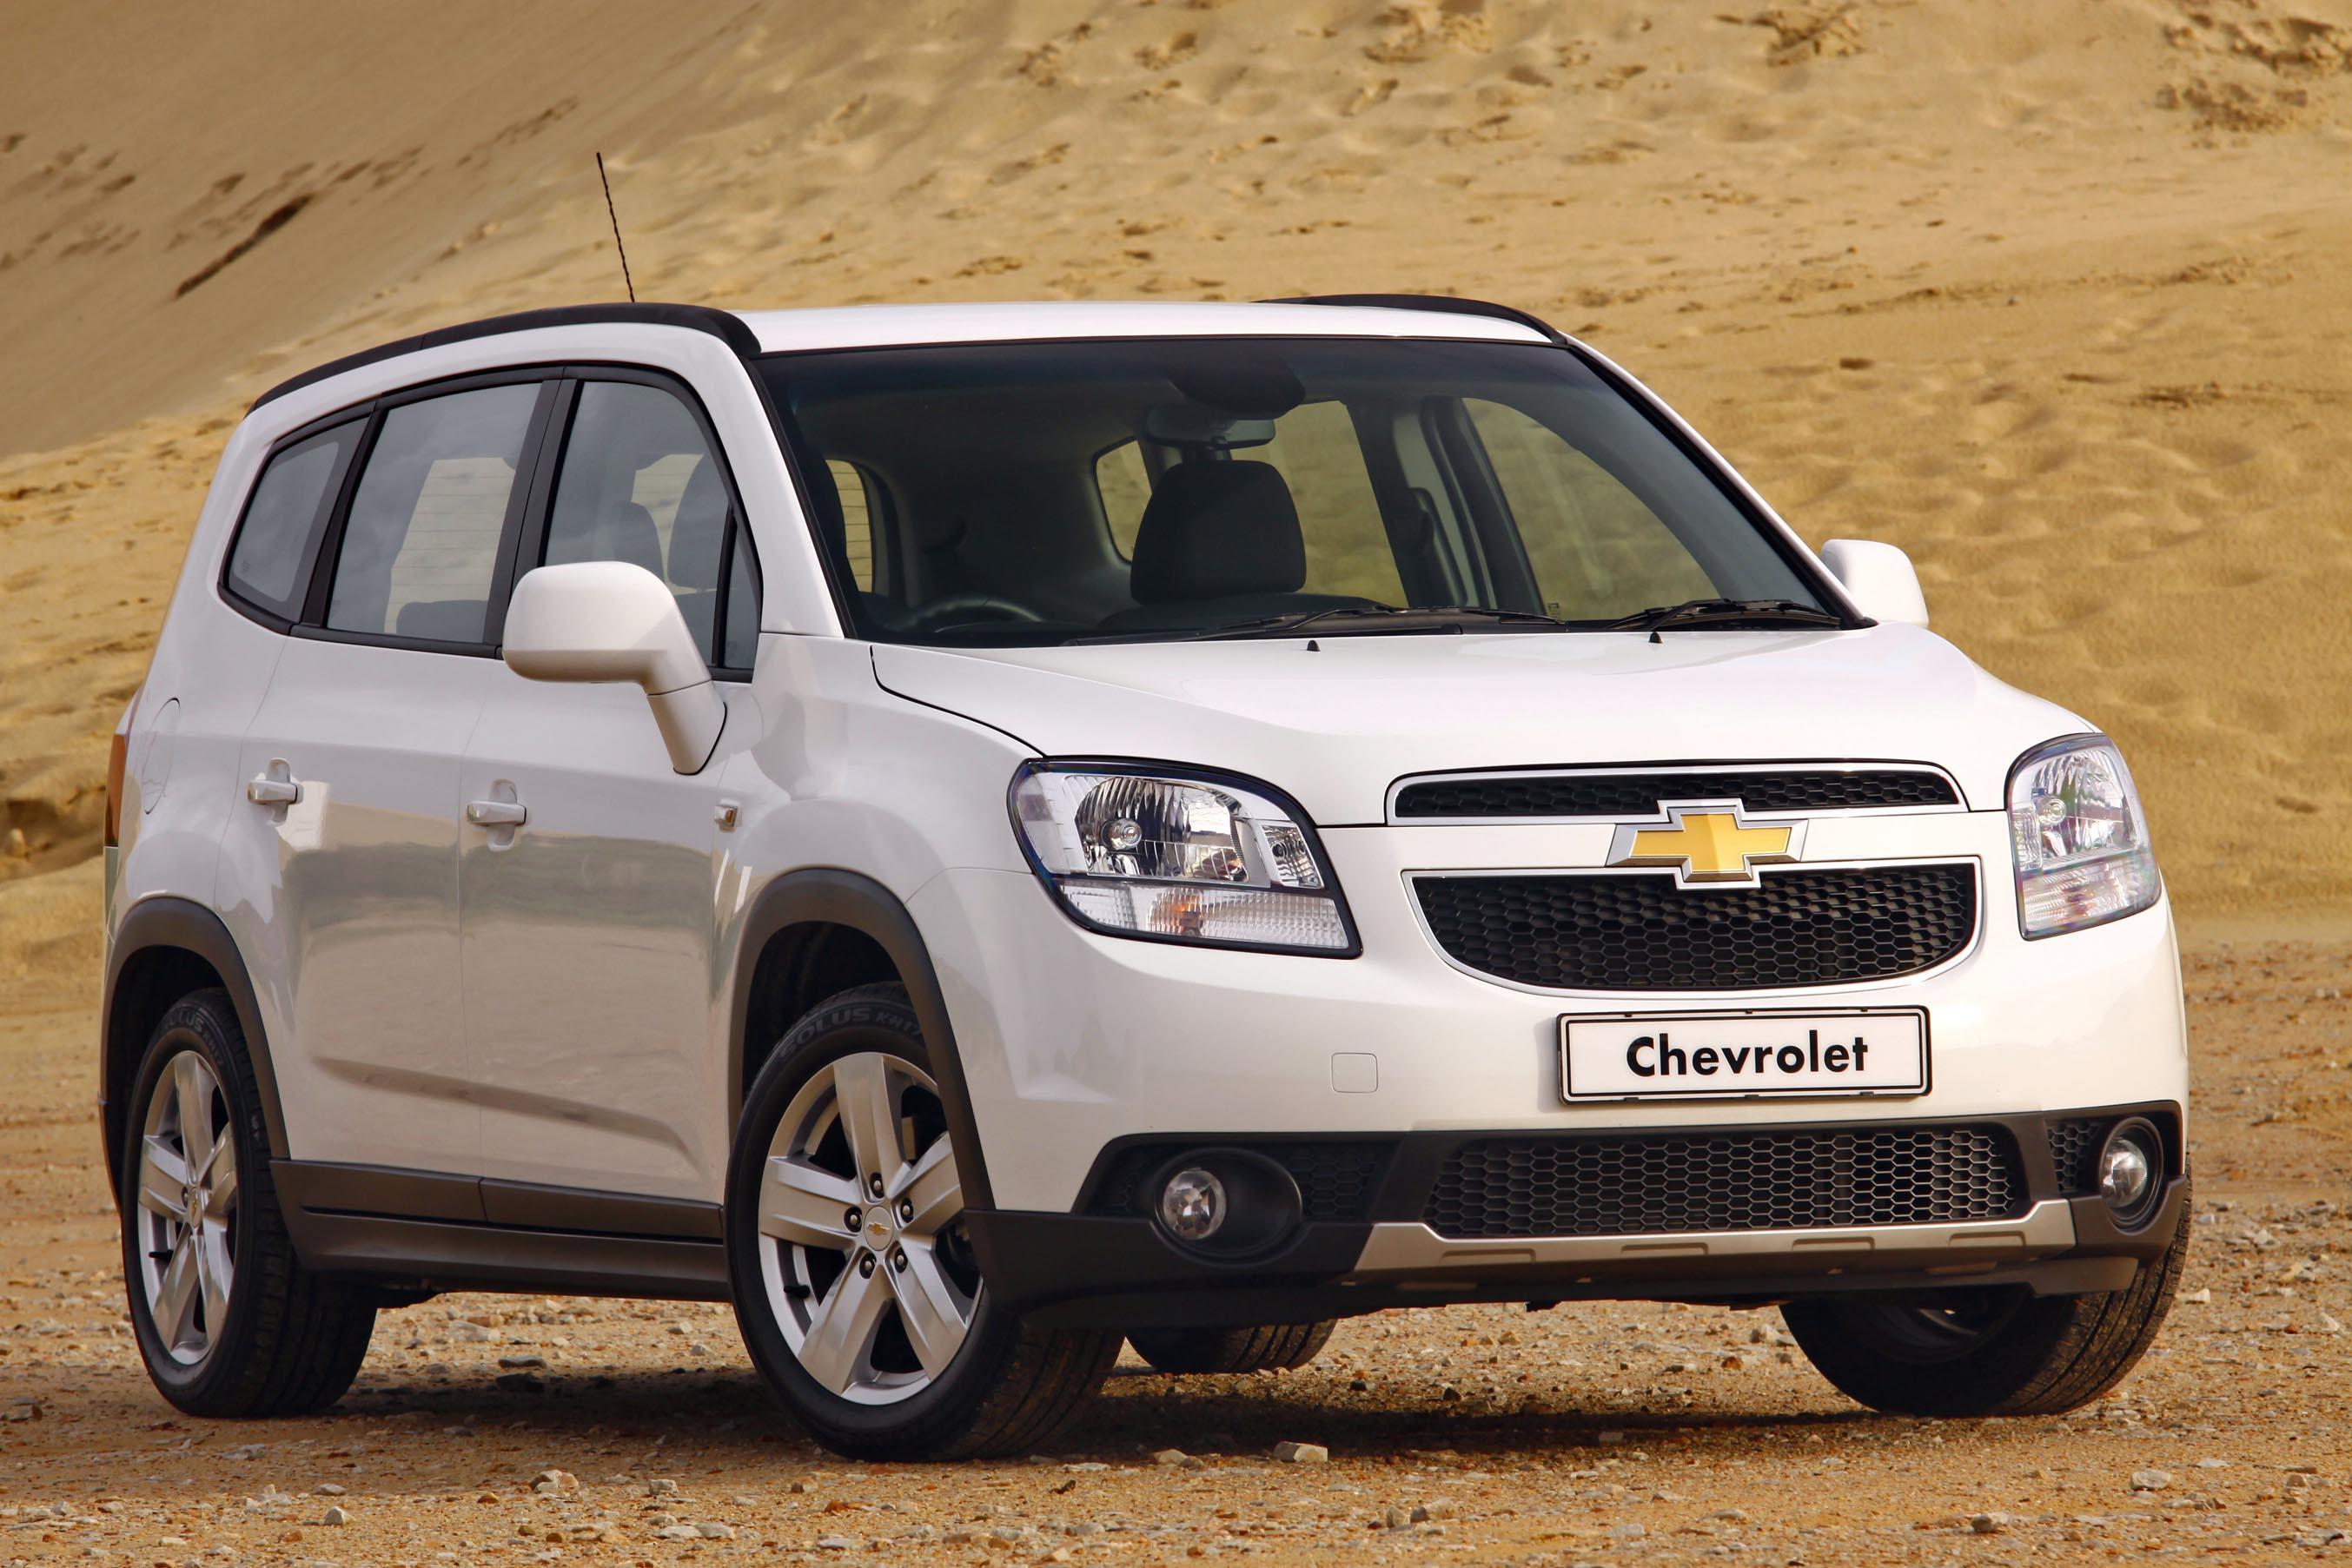 Chevrolet Orlando 1 8 Ls 2013 New Car Review Surf4cars Motoring News